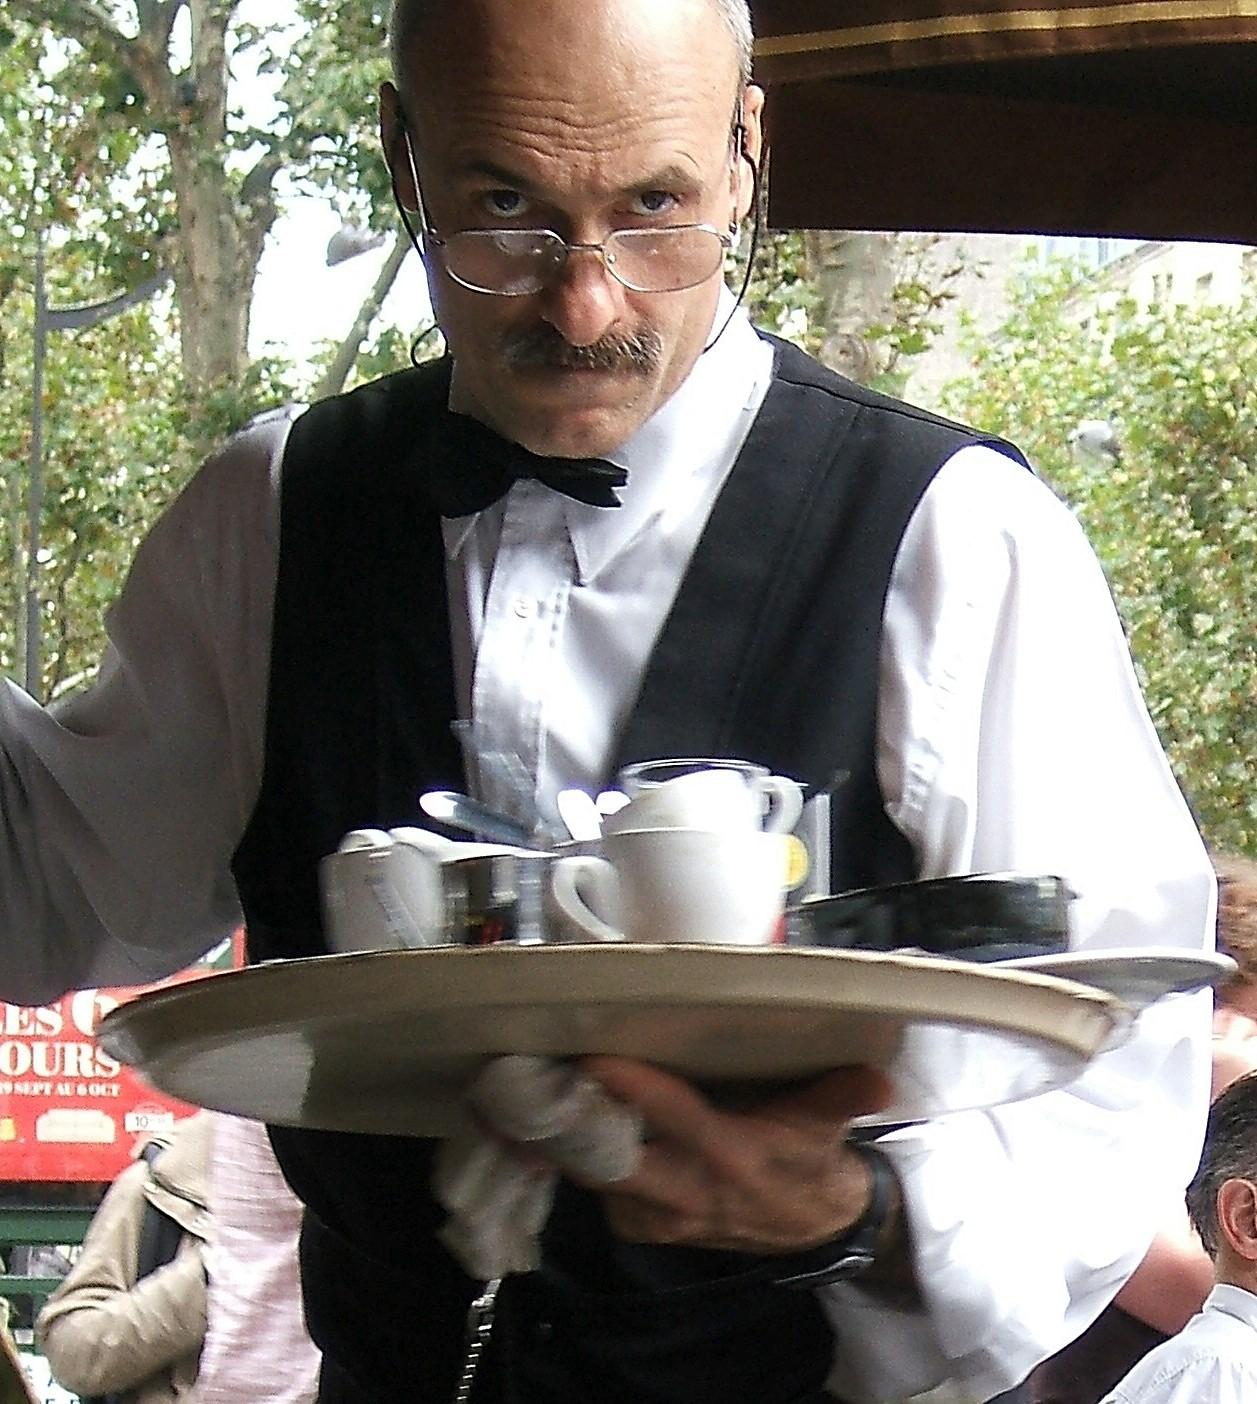 waiter_Christina Campisi_Flickr